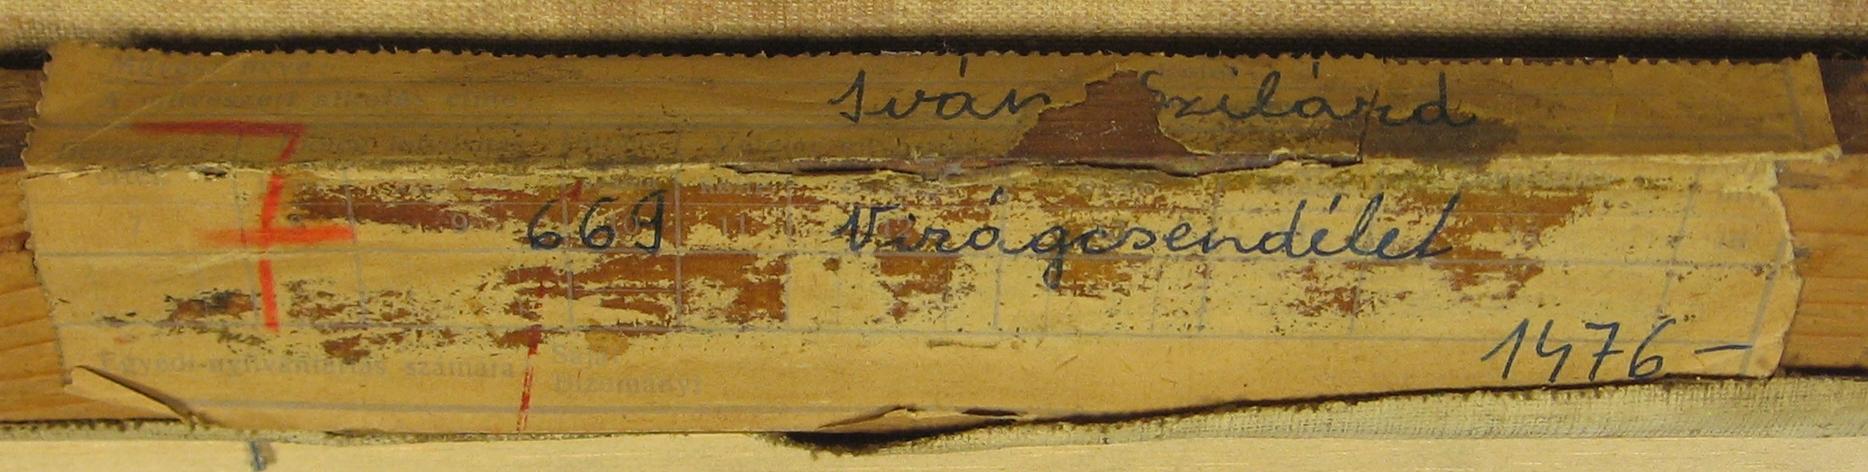 12-5c.jpg (1868�472)